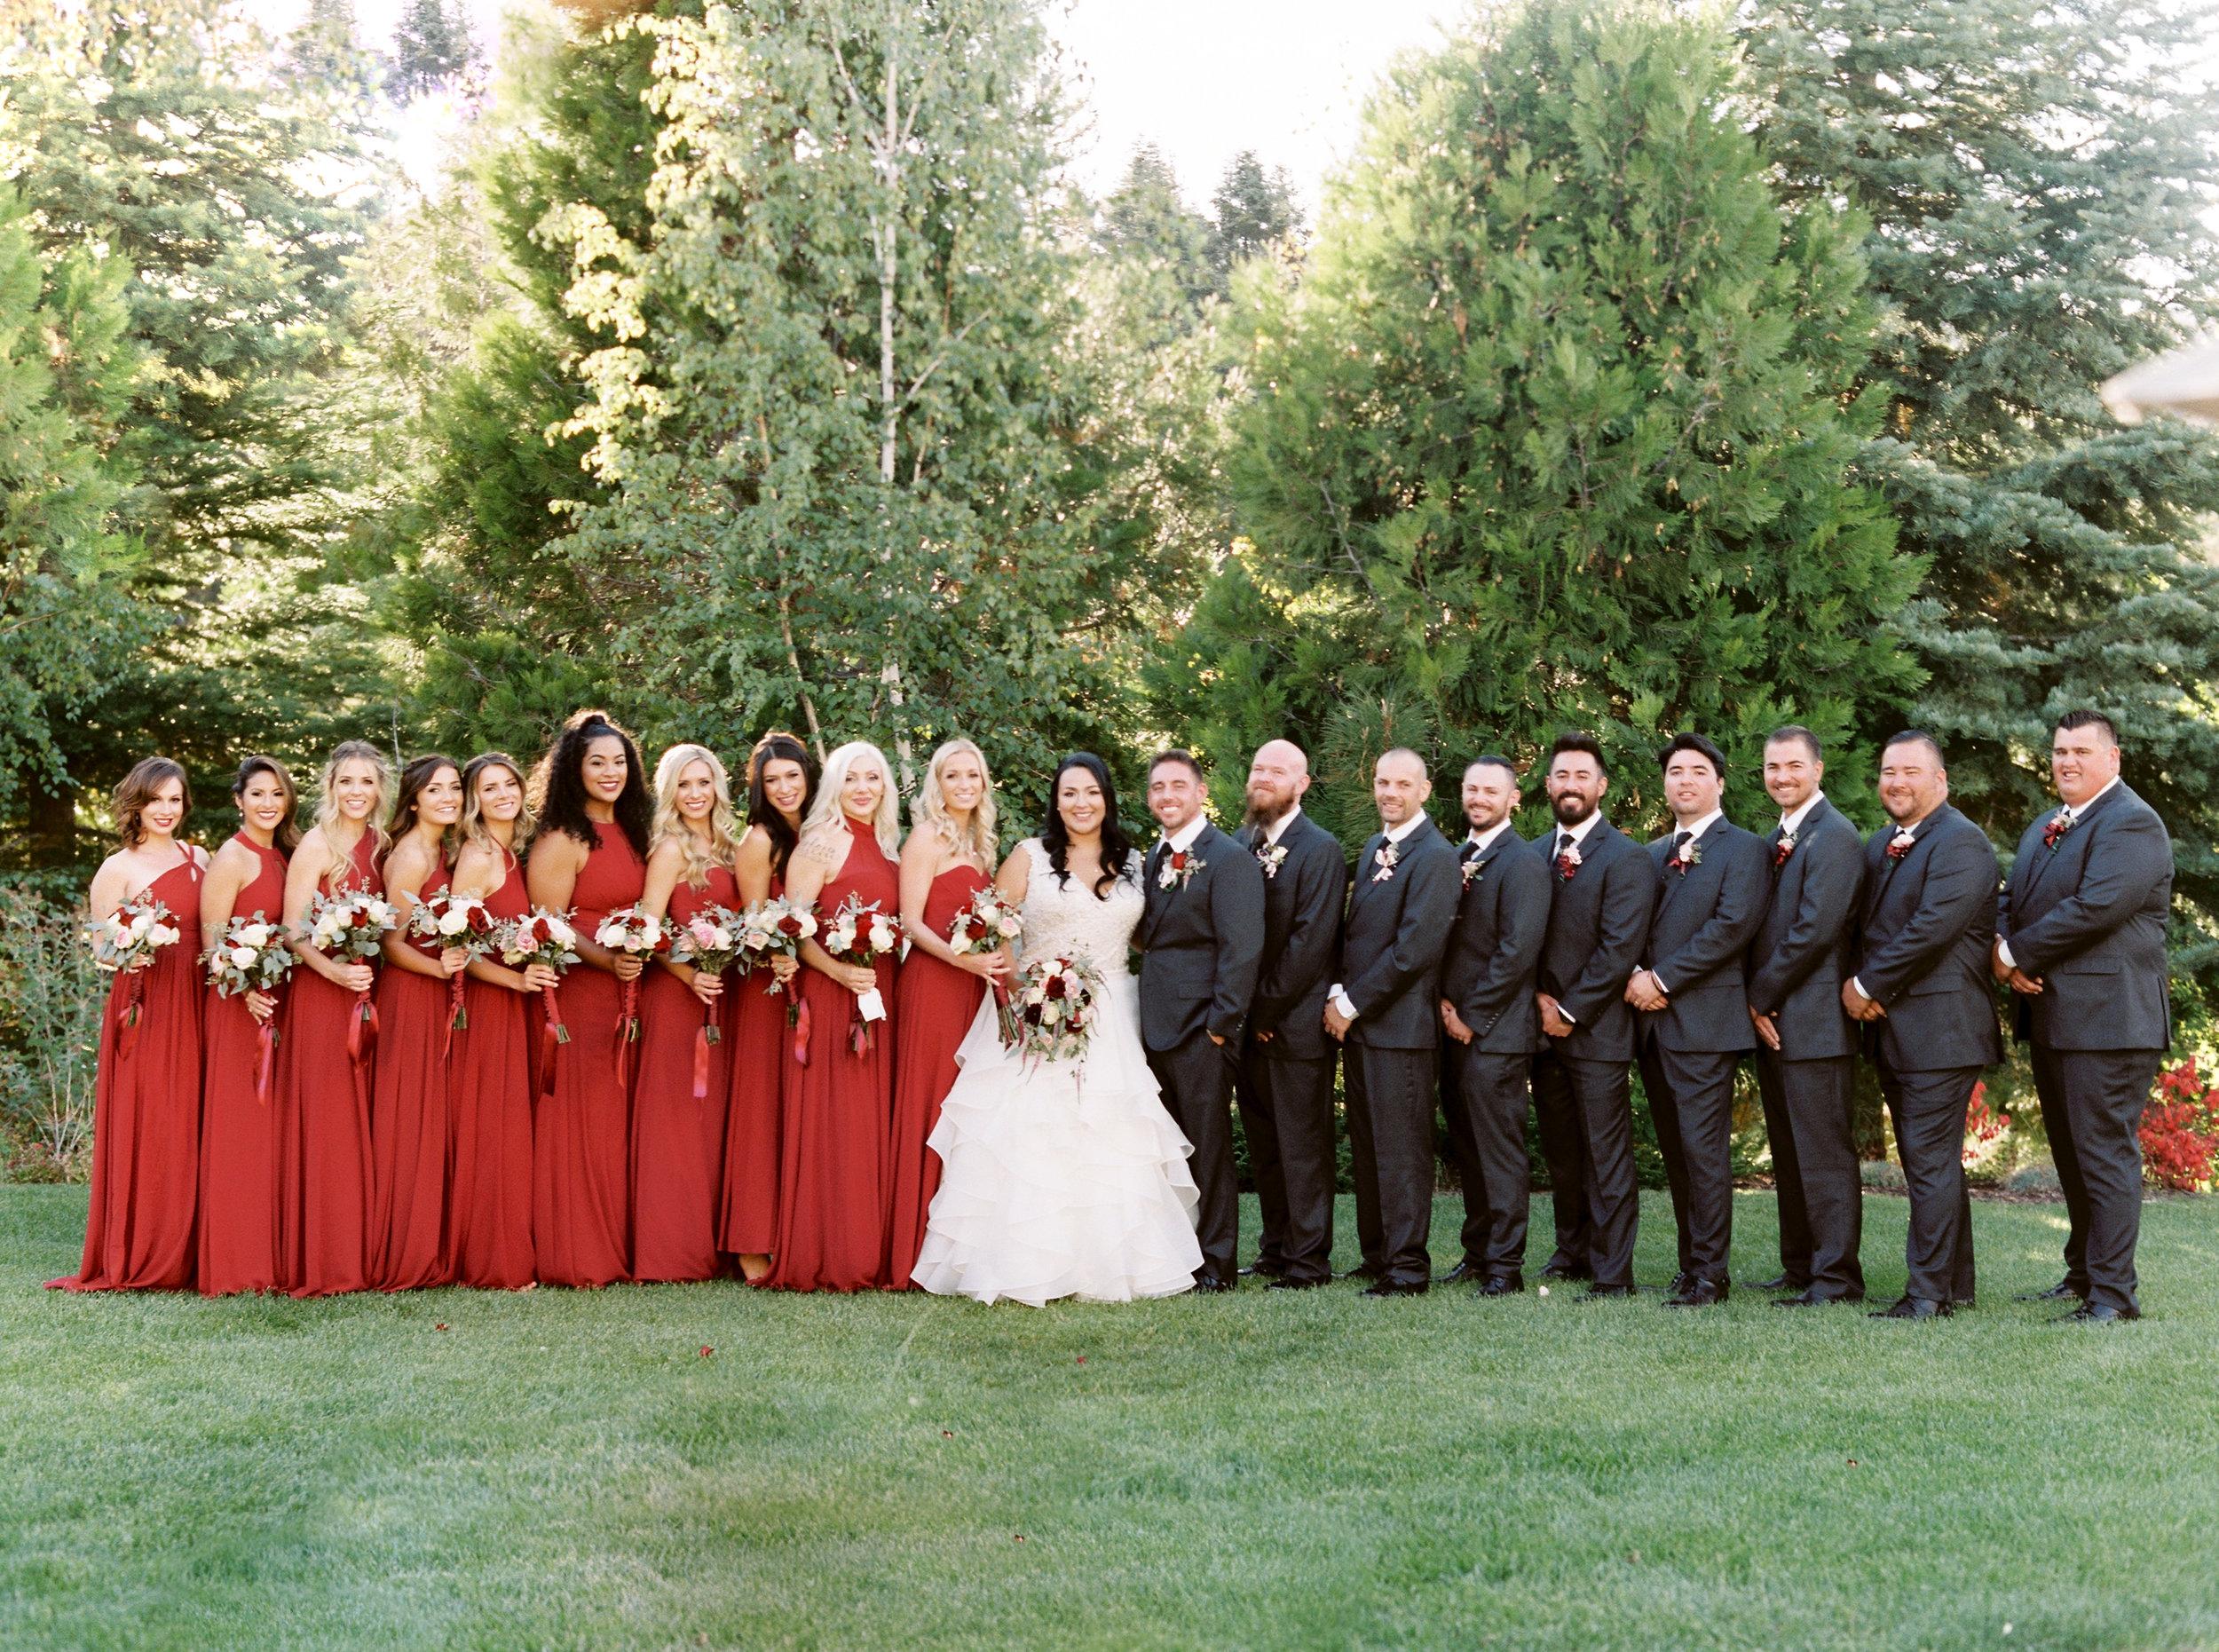 Tenaya-lodge-wedding-at-yosemite-national-park-california-84.jpg